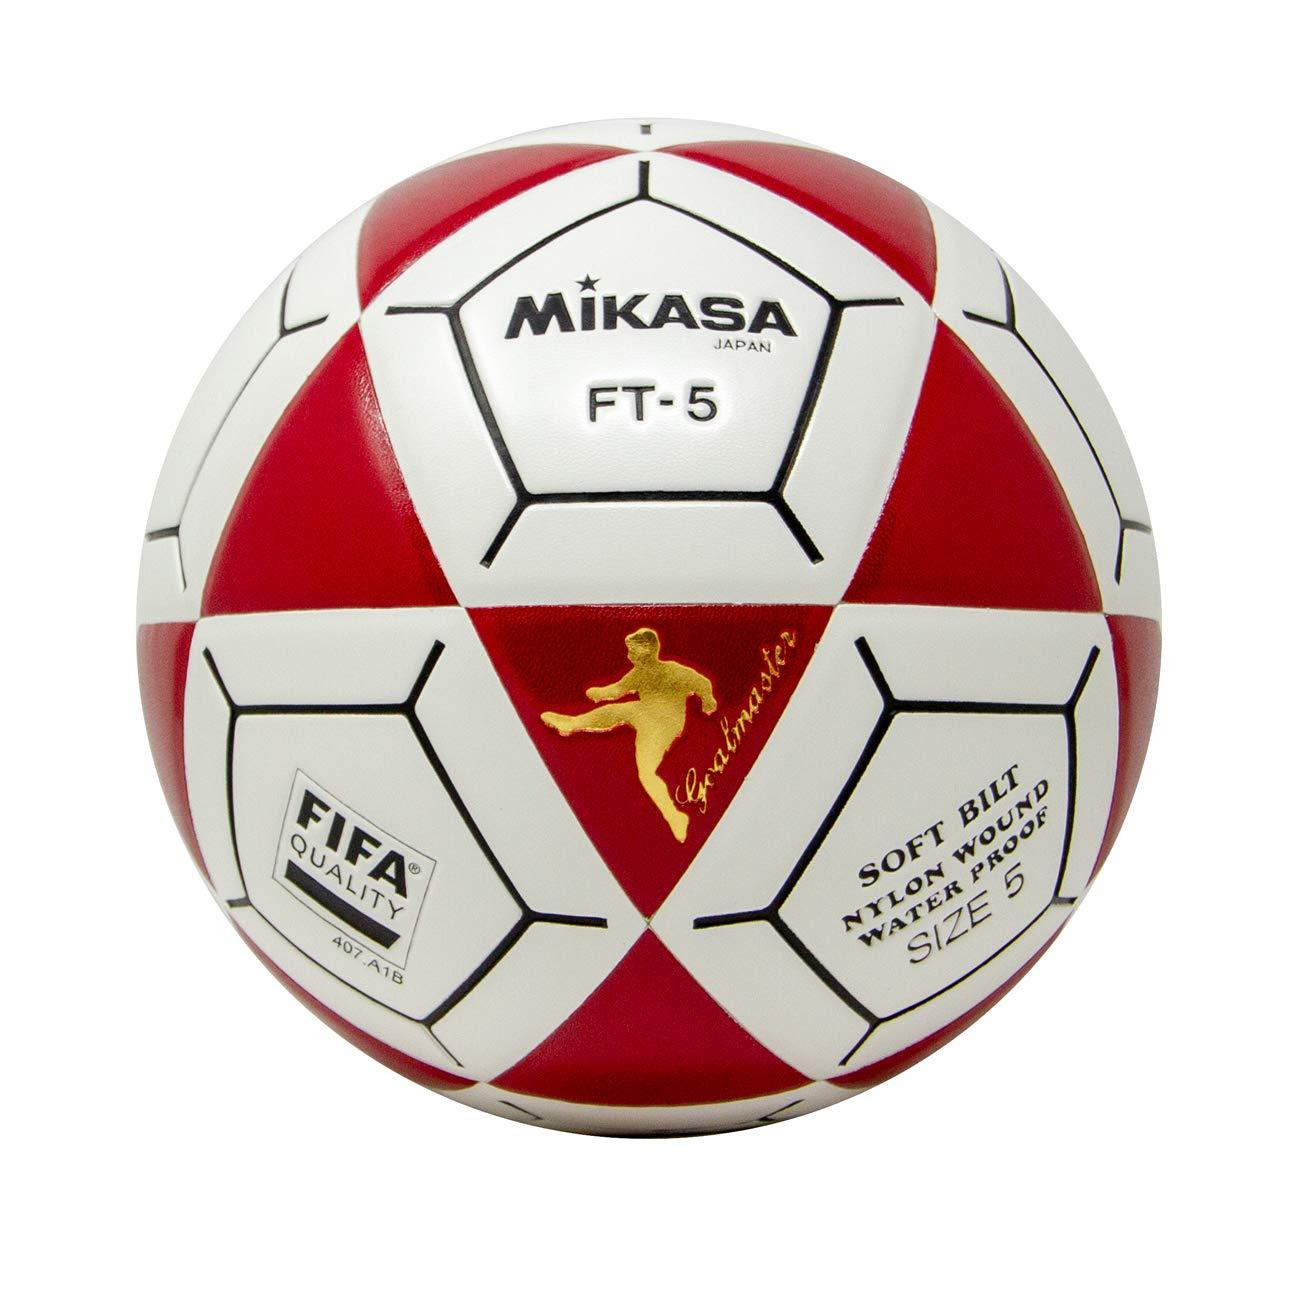 Mikasa FT5 Goal Master - Balón de fútbol, Color Rojo y Blanco ...